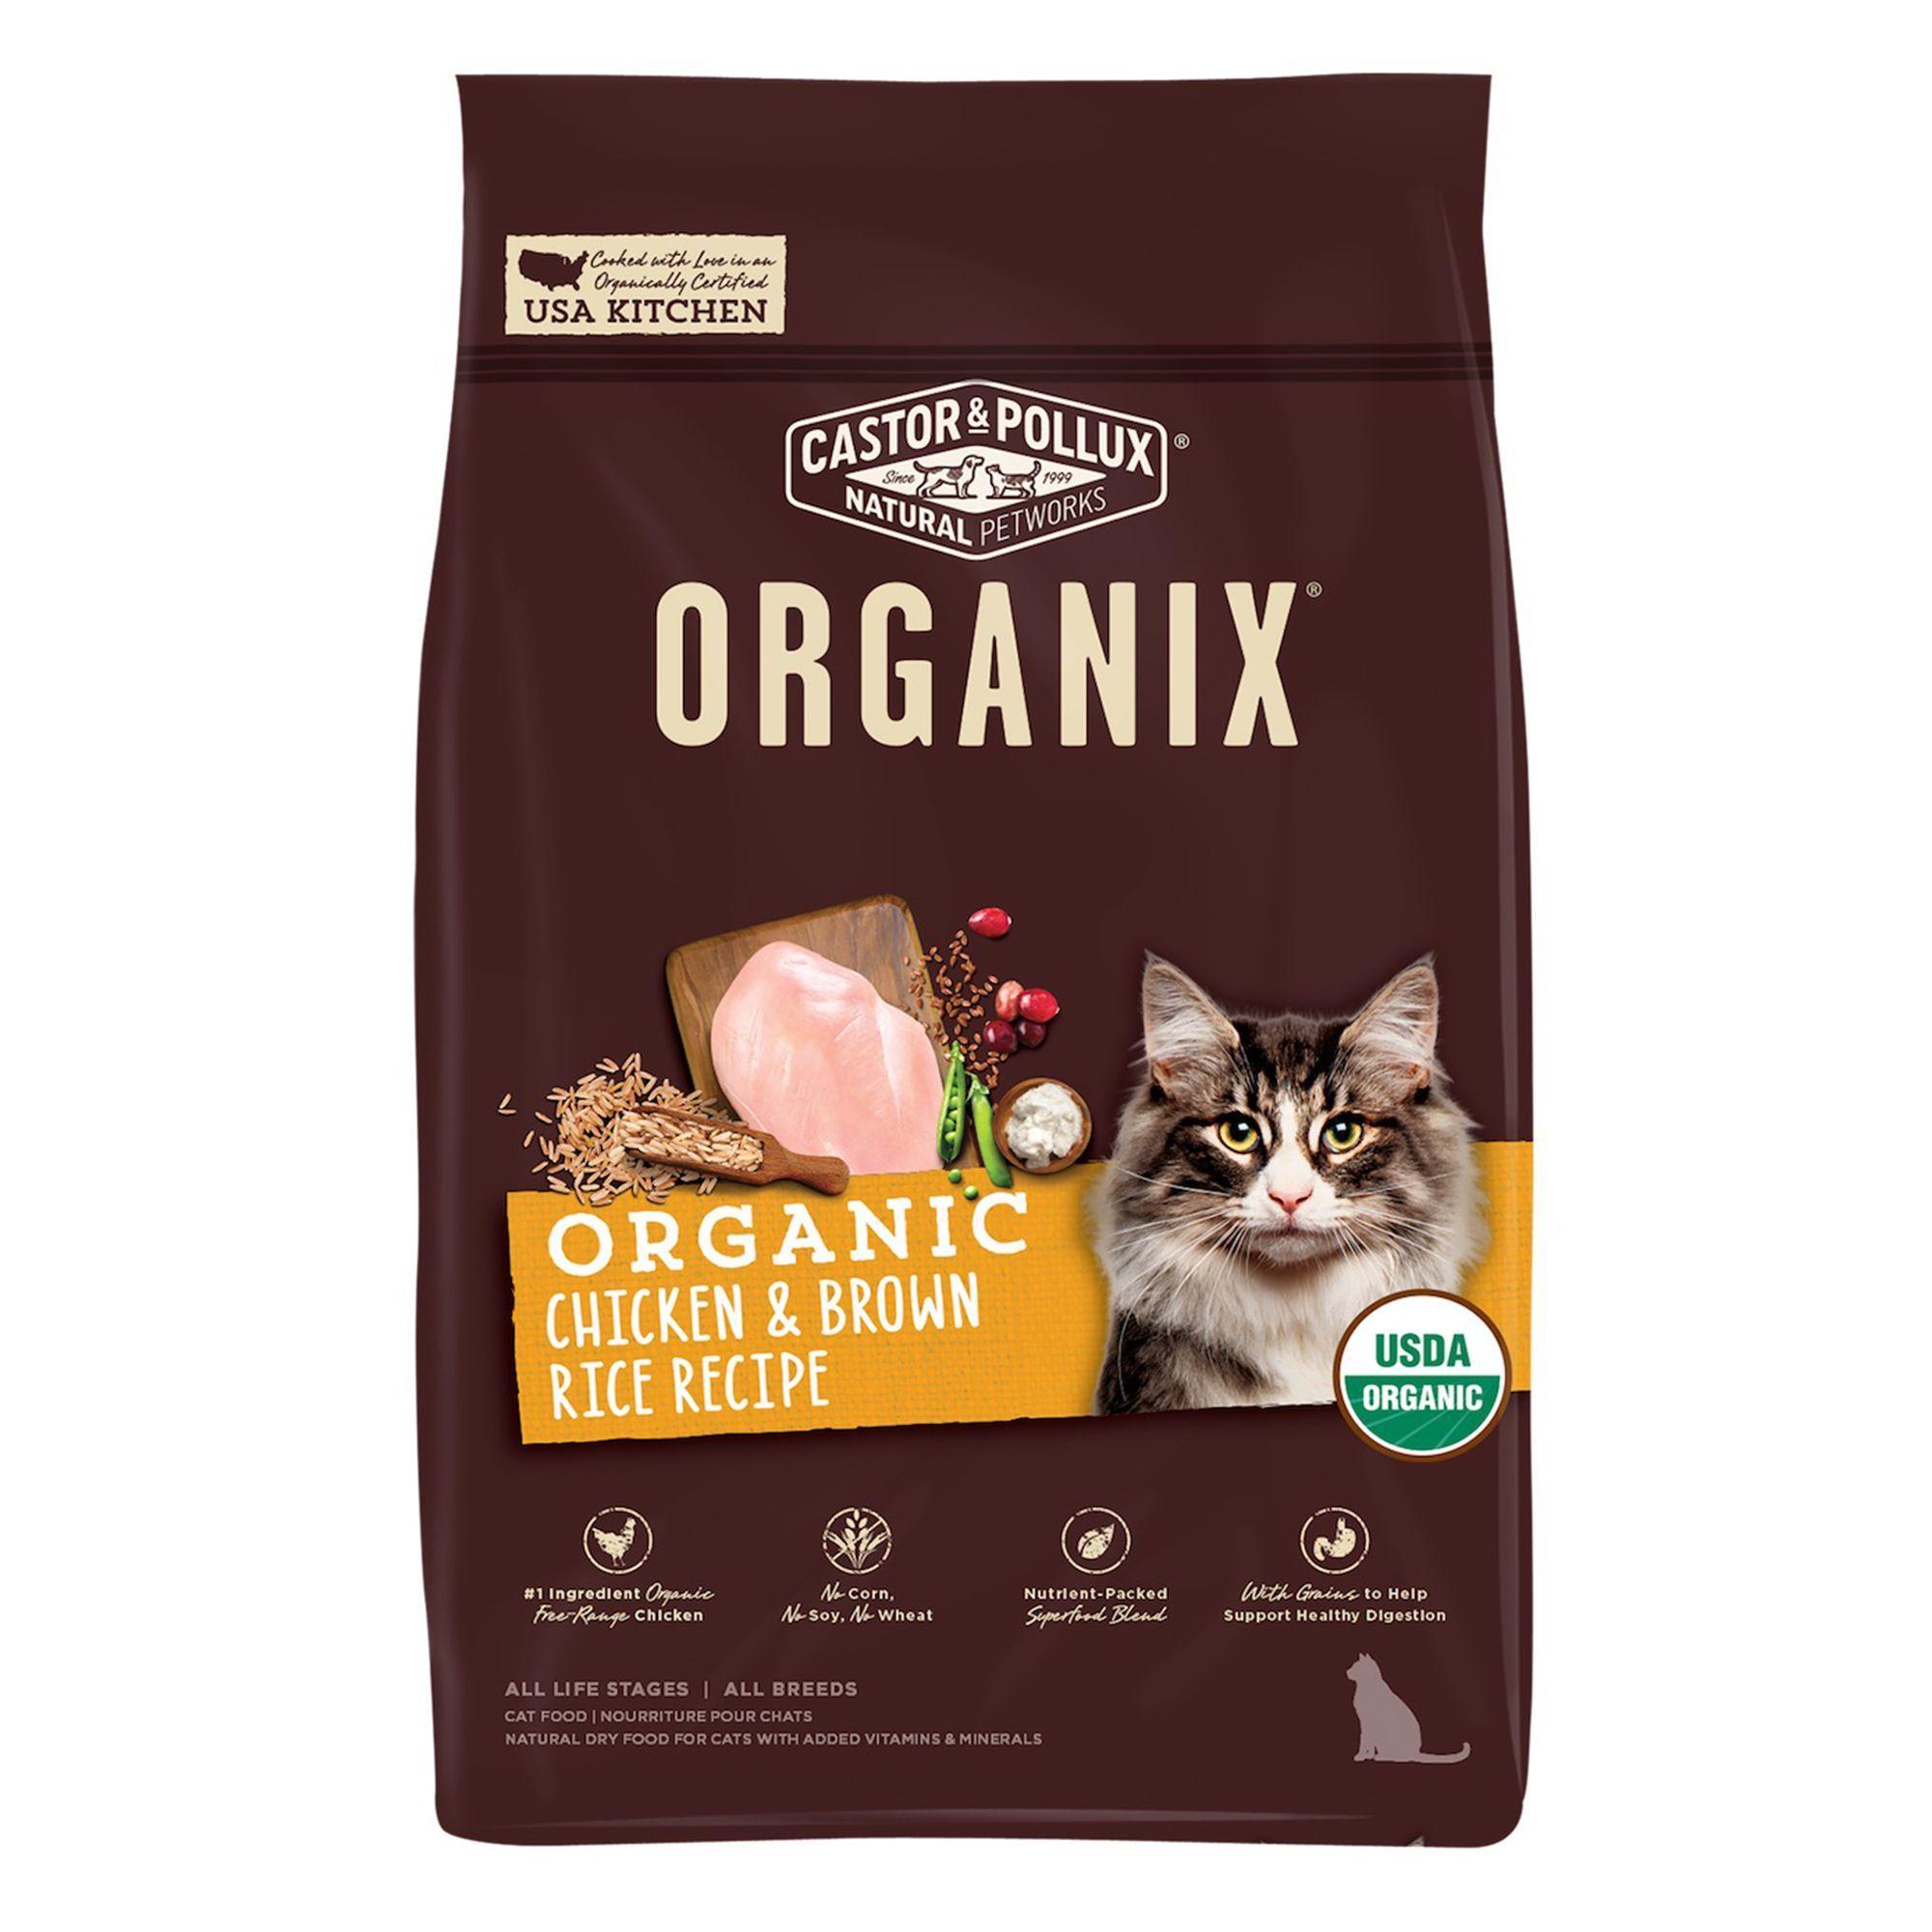 Castor Pollux Organix Chicken Brown Rice Cat Food Organic